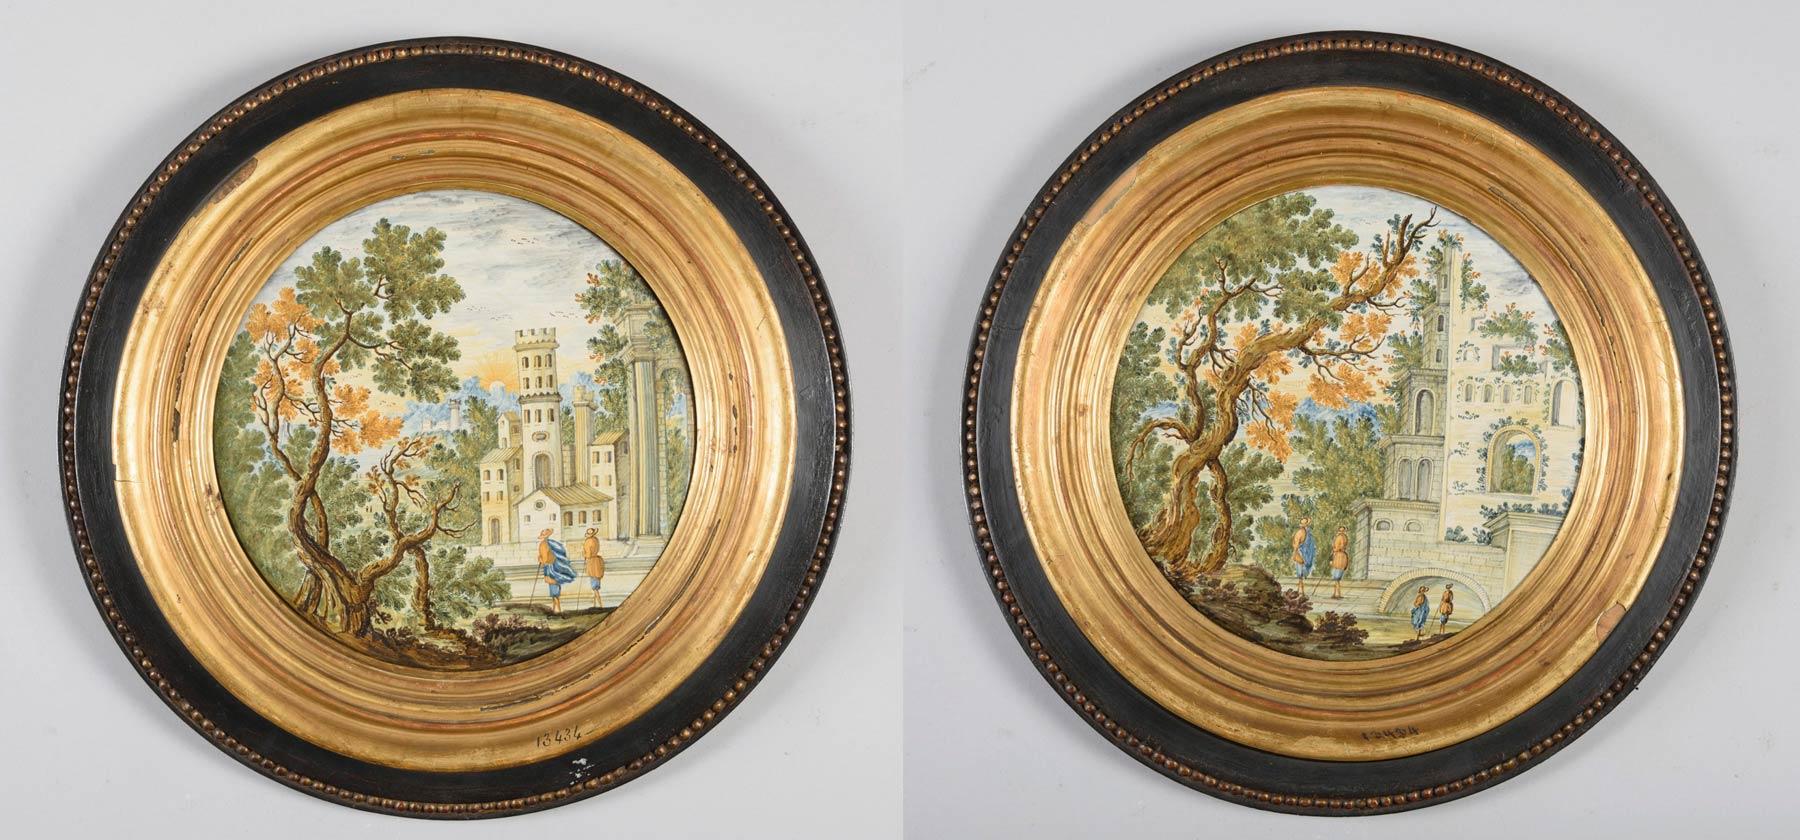 944-pareja-de-tondos-en-ceramica-de-castelli-s-xviii.4